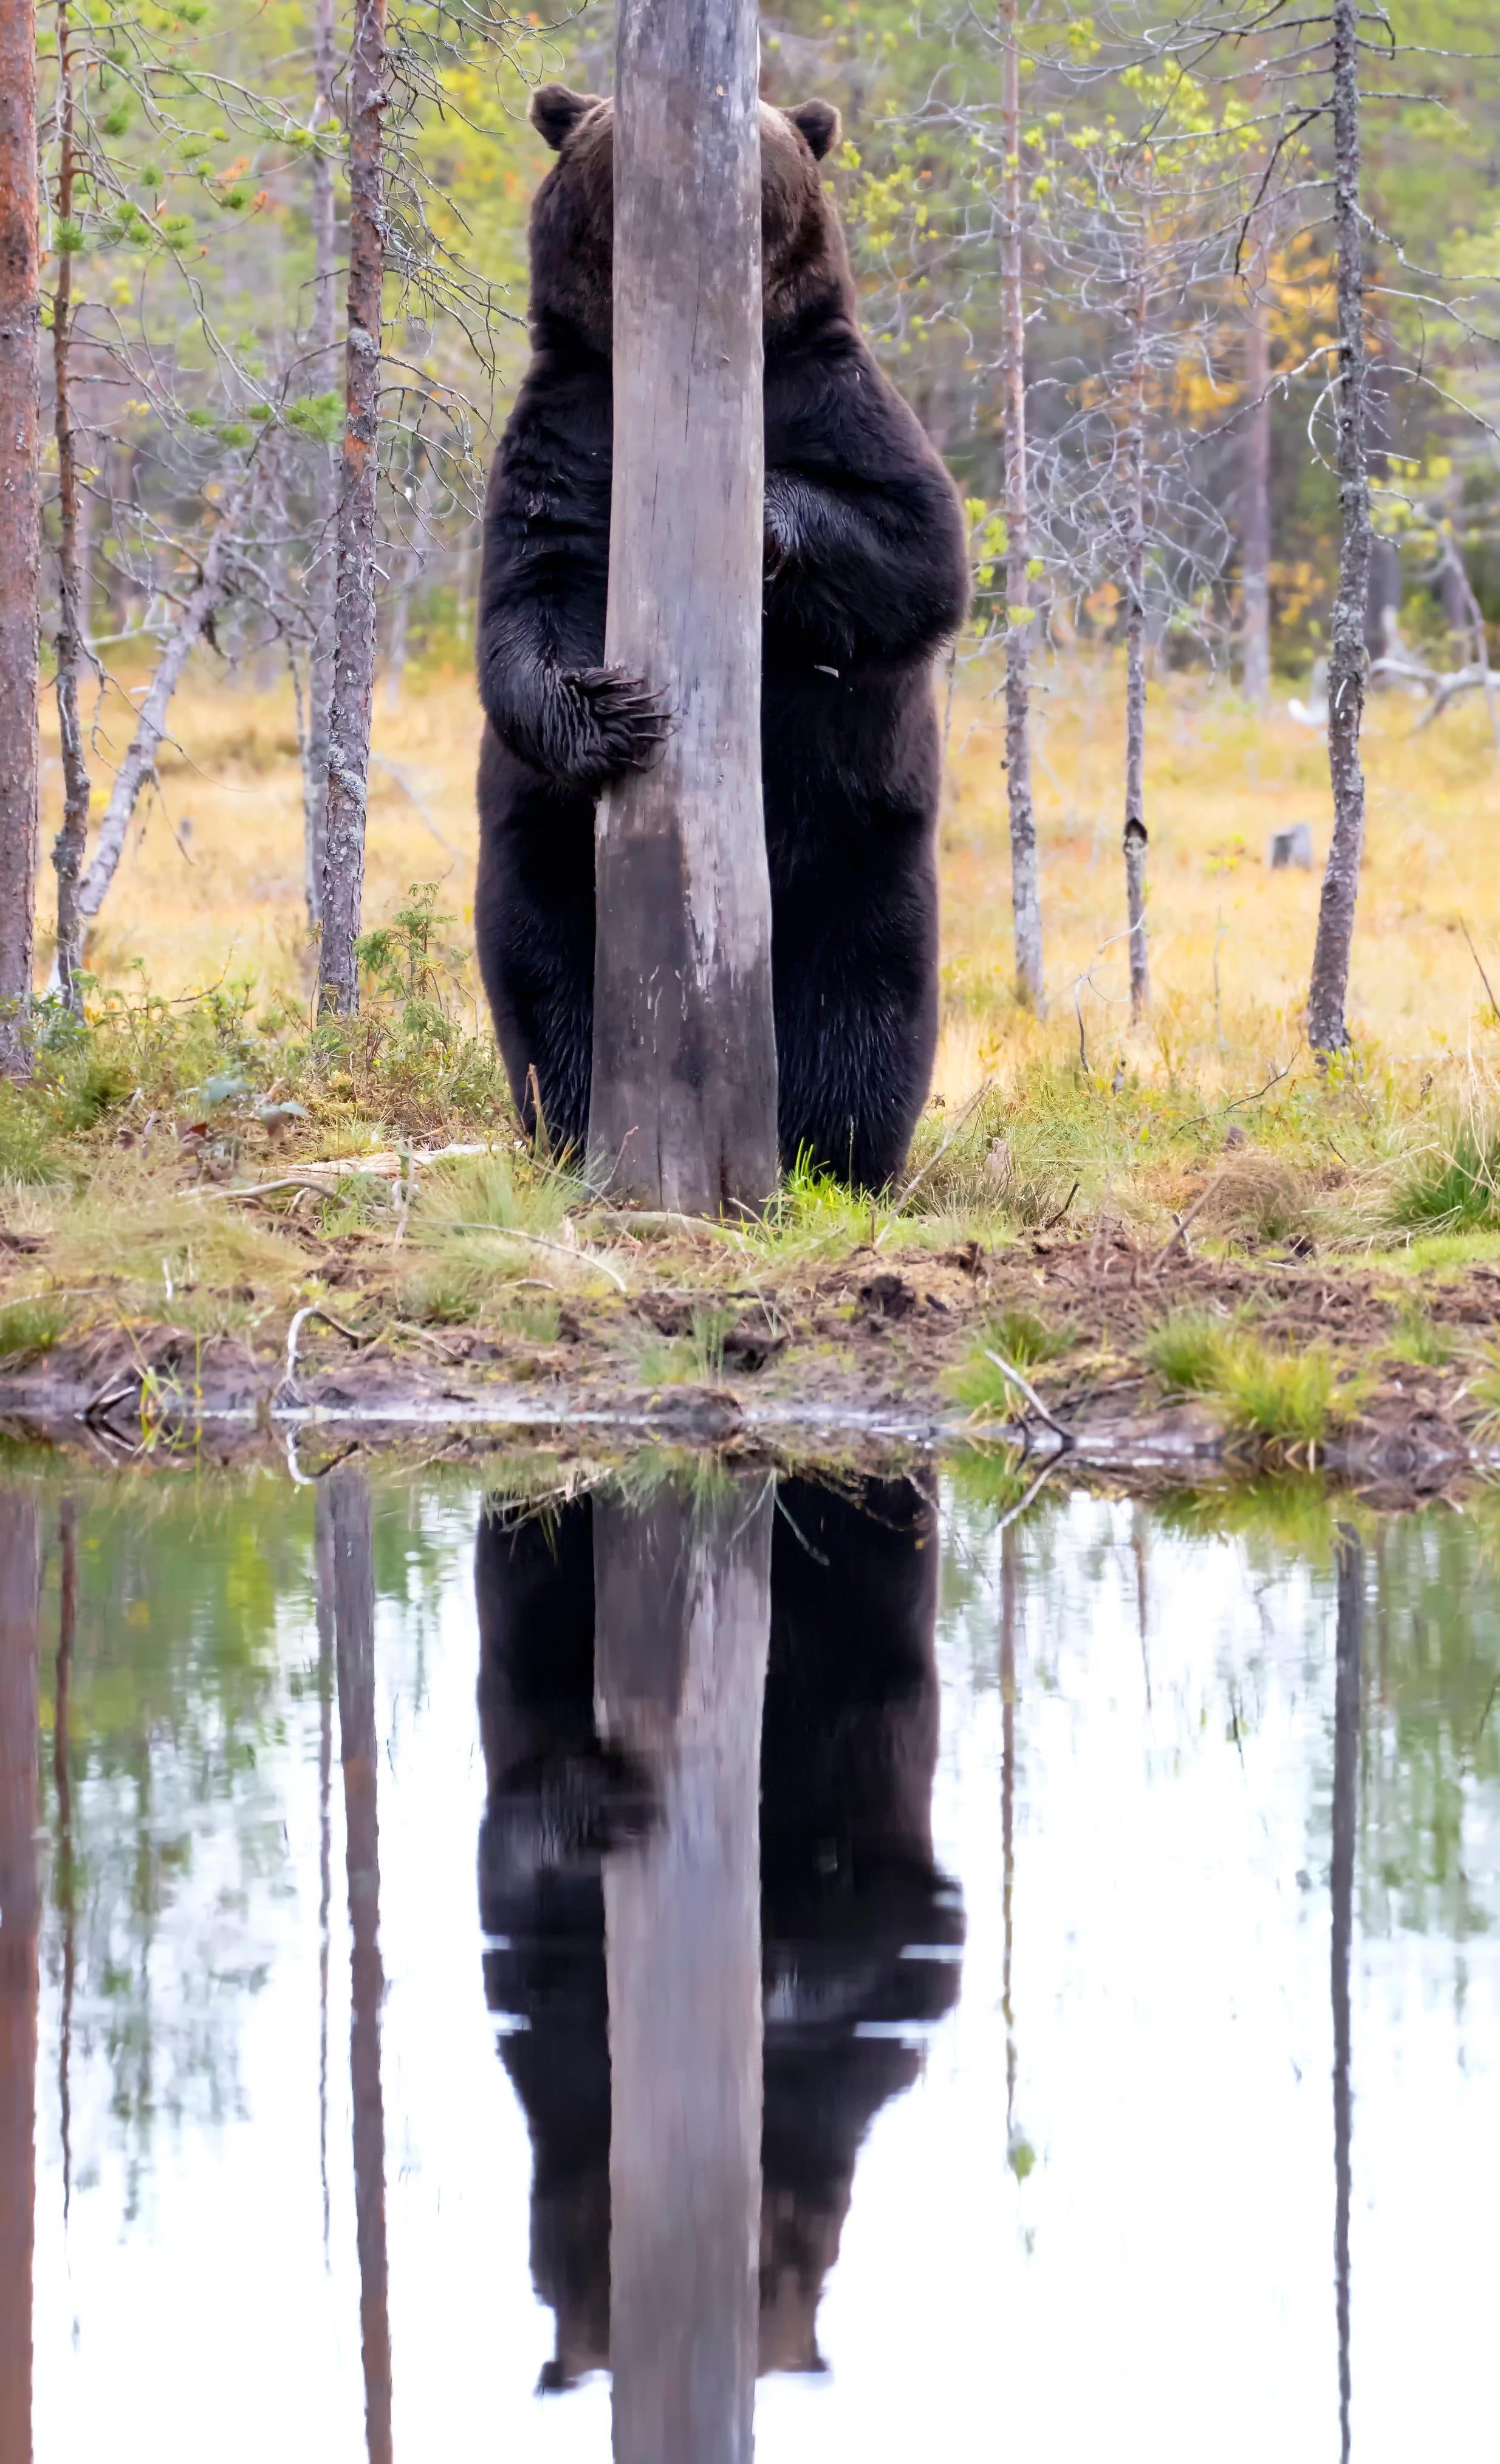 Las 44 mejores imágenes de 'The Comedy Wildlife Photography Awards 2020'.  +OJO DATOS - Foro Coches